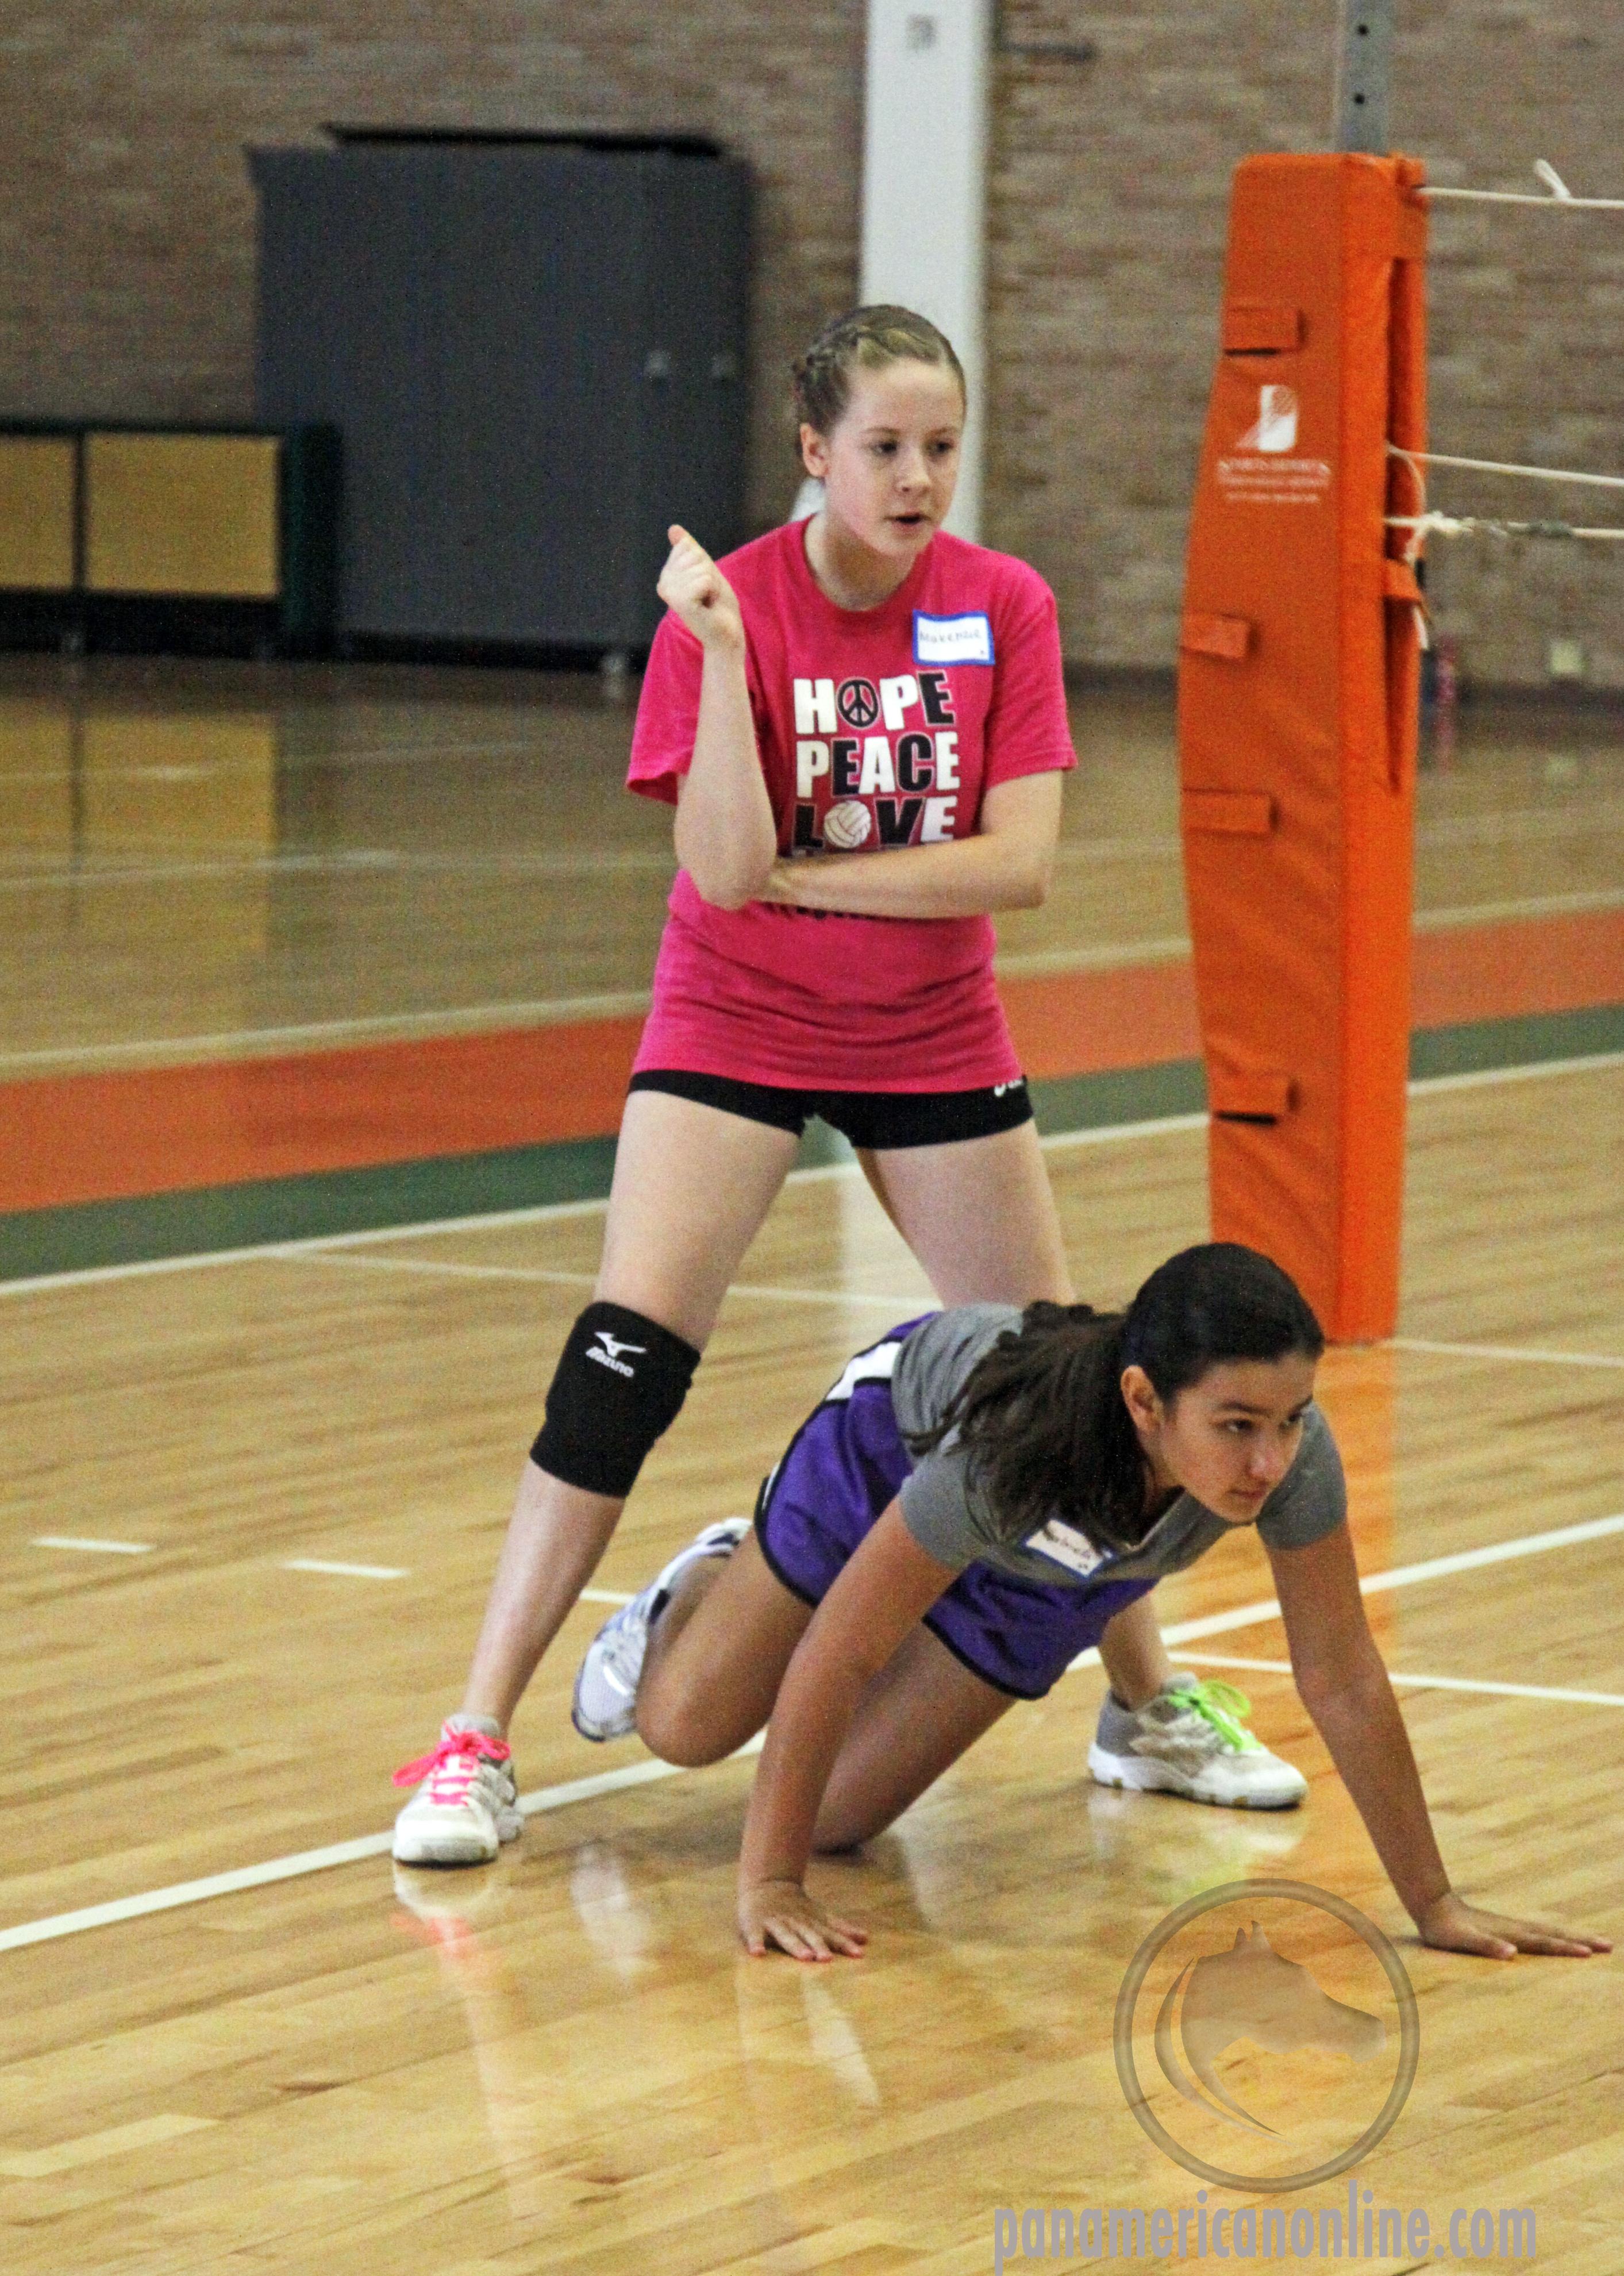 Virginia high school volleyball team raise money for Autism Speaks